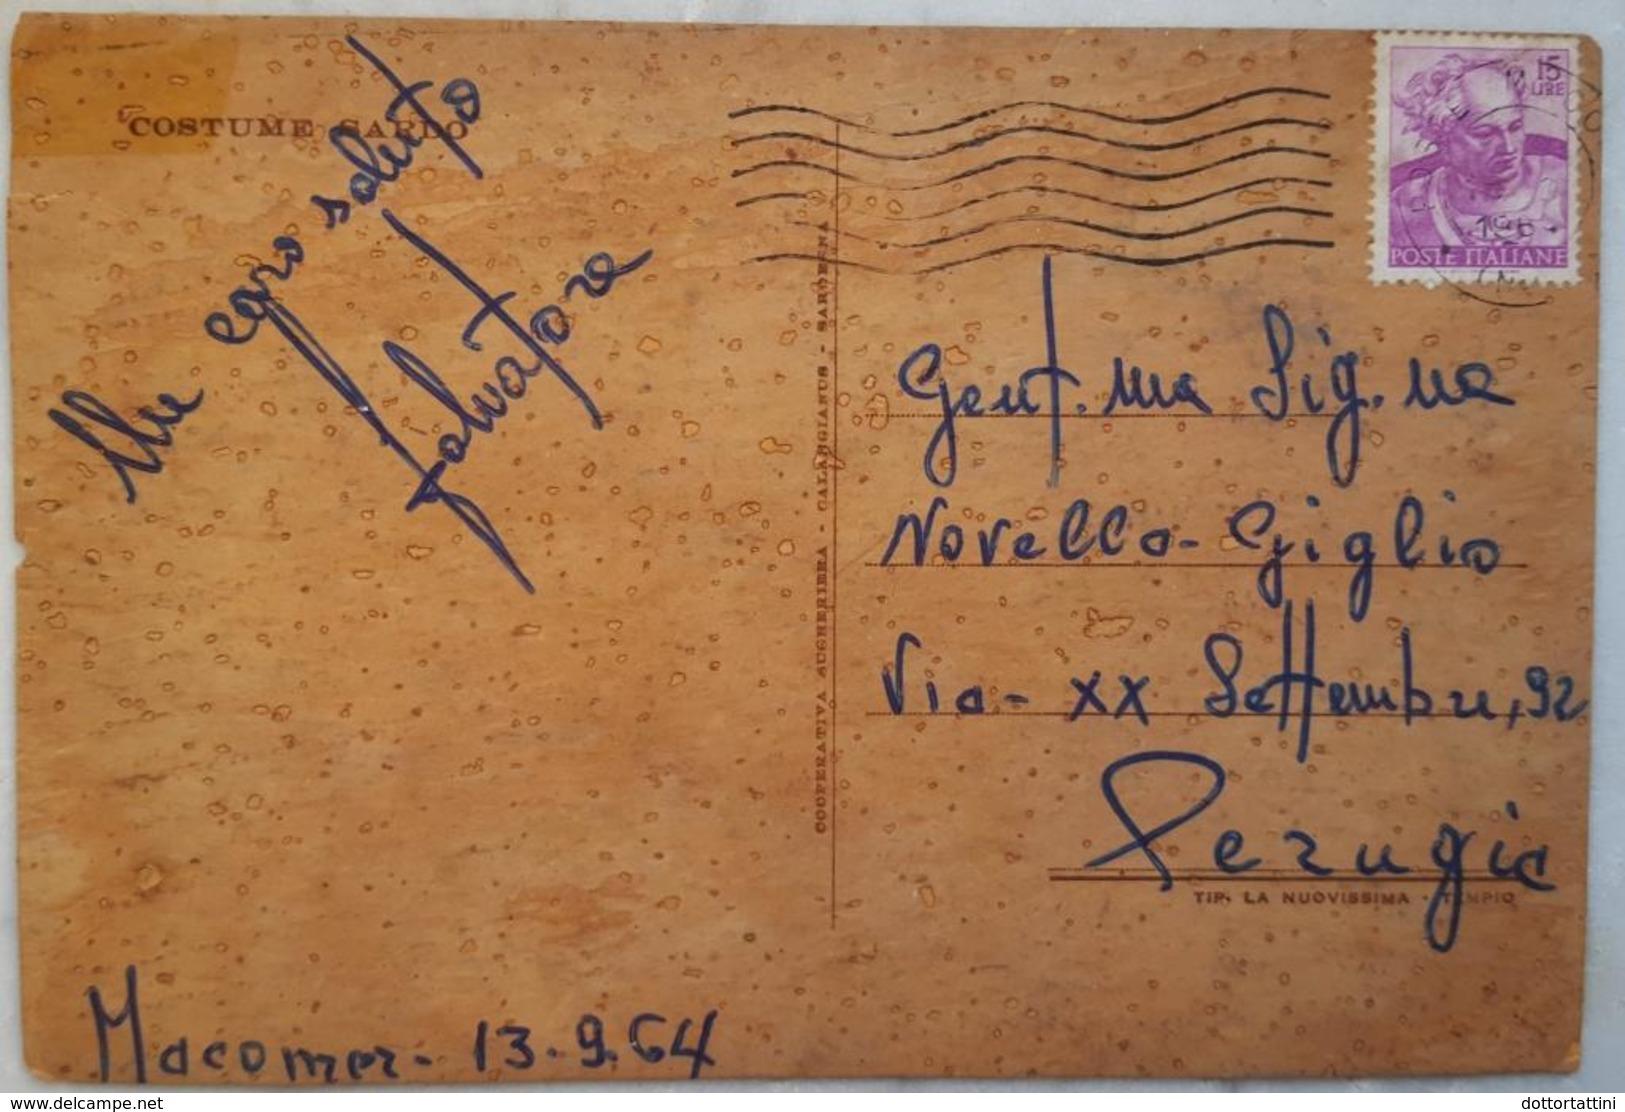 Sardegna - Costumi Sardi - Cartolina In Sughero - Postcard In Cork - Carte En Liege - Costumes - ITALY Vg 1964 - Cartoline